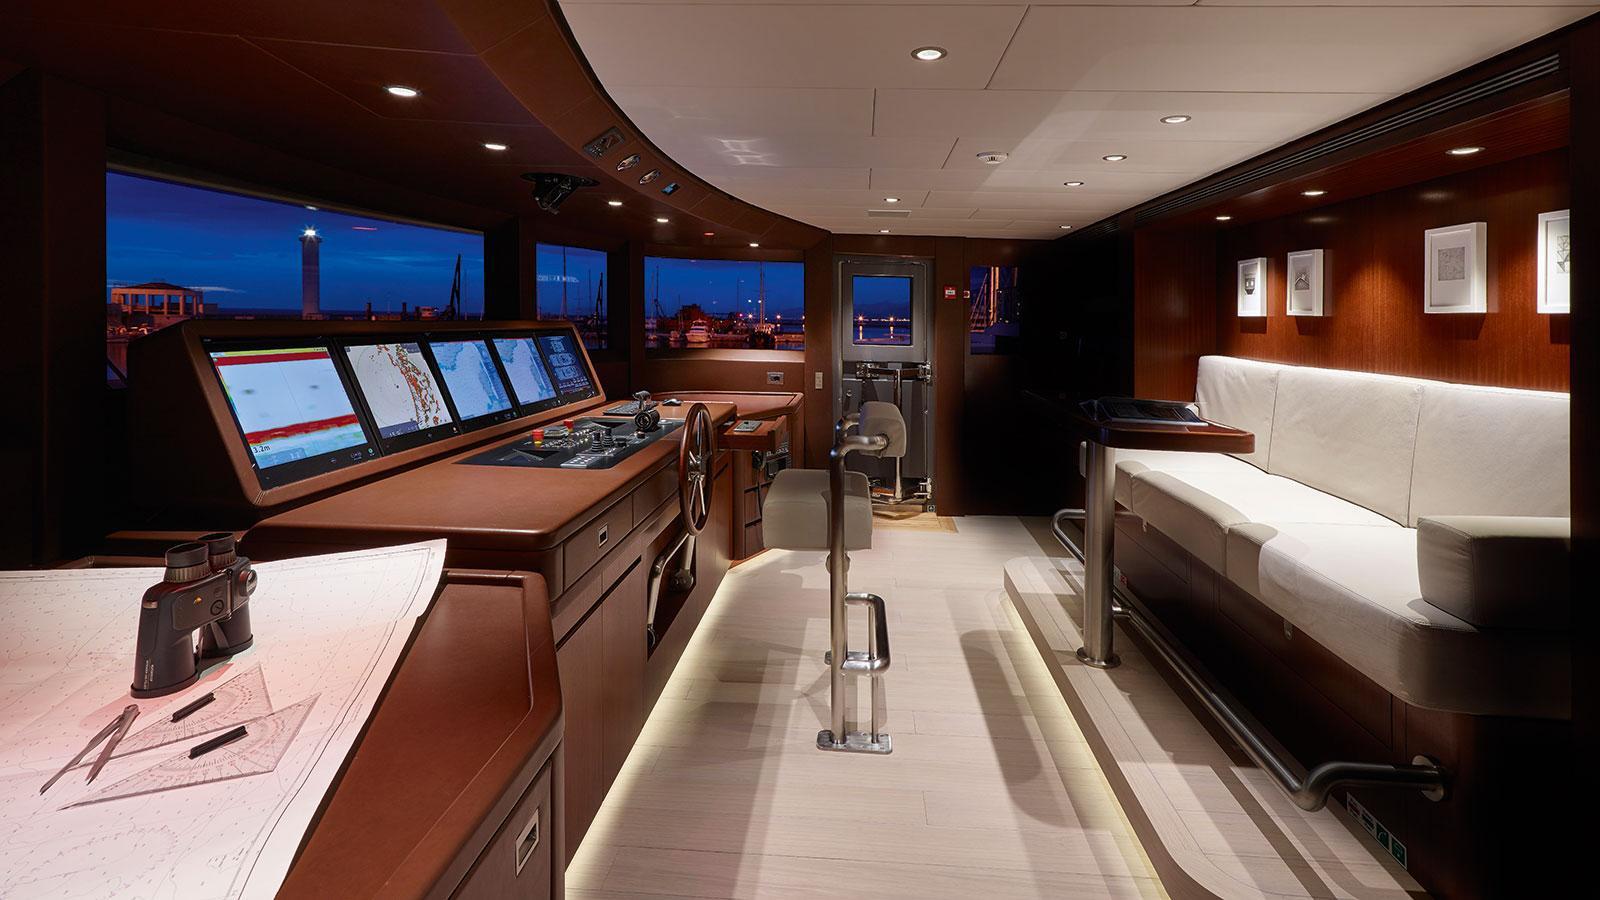 moka-expedition-motor-yacht-sanlorenzo-460-exp-2015-42m-bridge